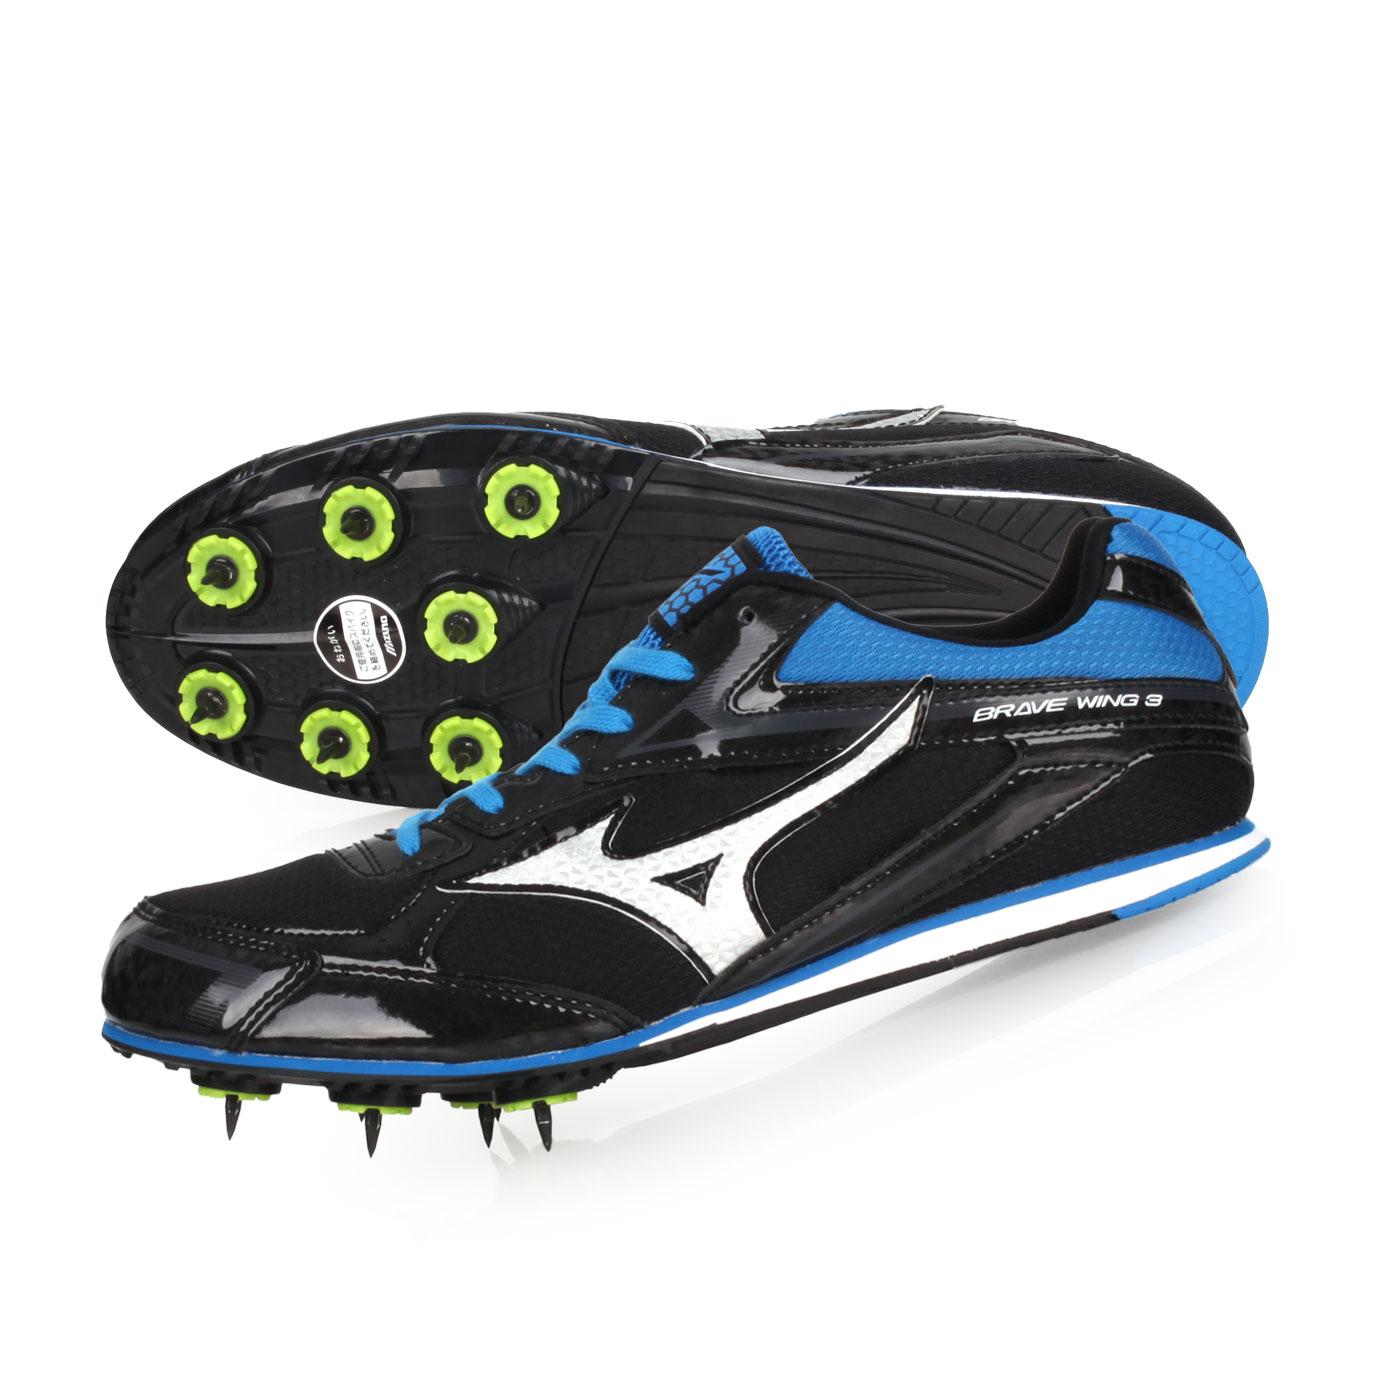 MIZUNO 田徑釘鞋-WIDE  @BRAVEWING 3@U1GA183127 - 黑藍銀